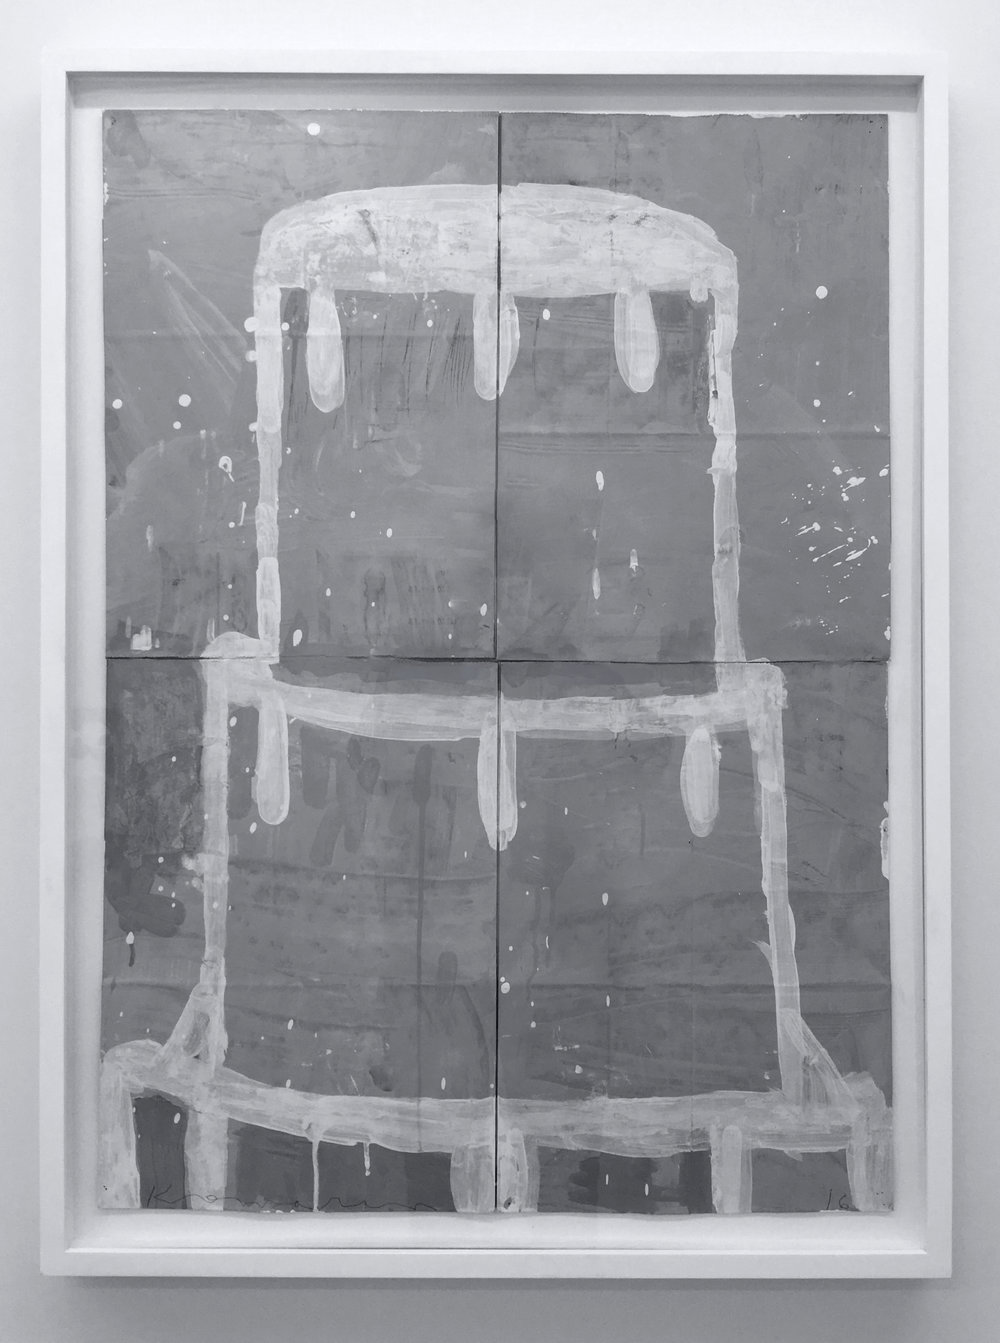 Gary Komarin, Cake, Stacked: Creme on Grey , 2016, Water Based Enamel Paint on Paper Sacks, 33.25 x 23.75 inches